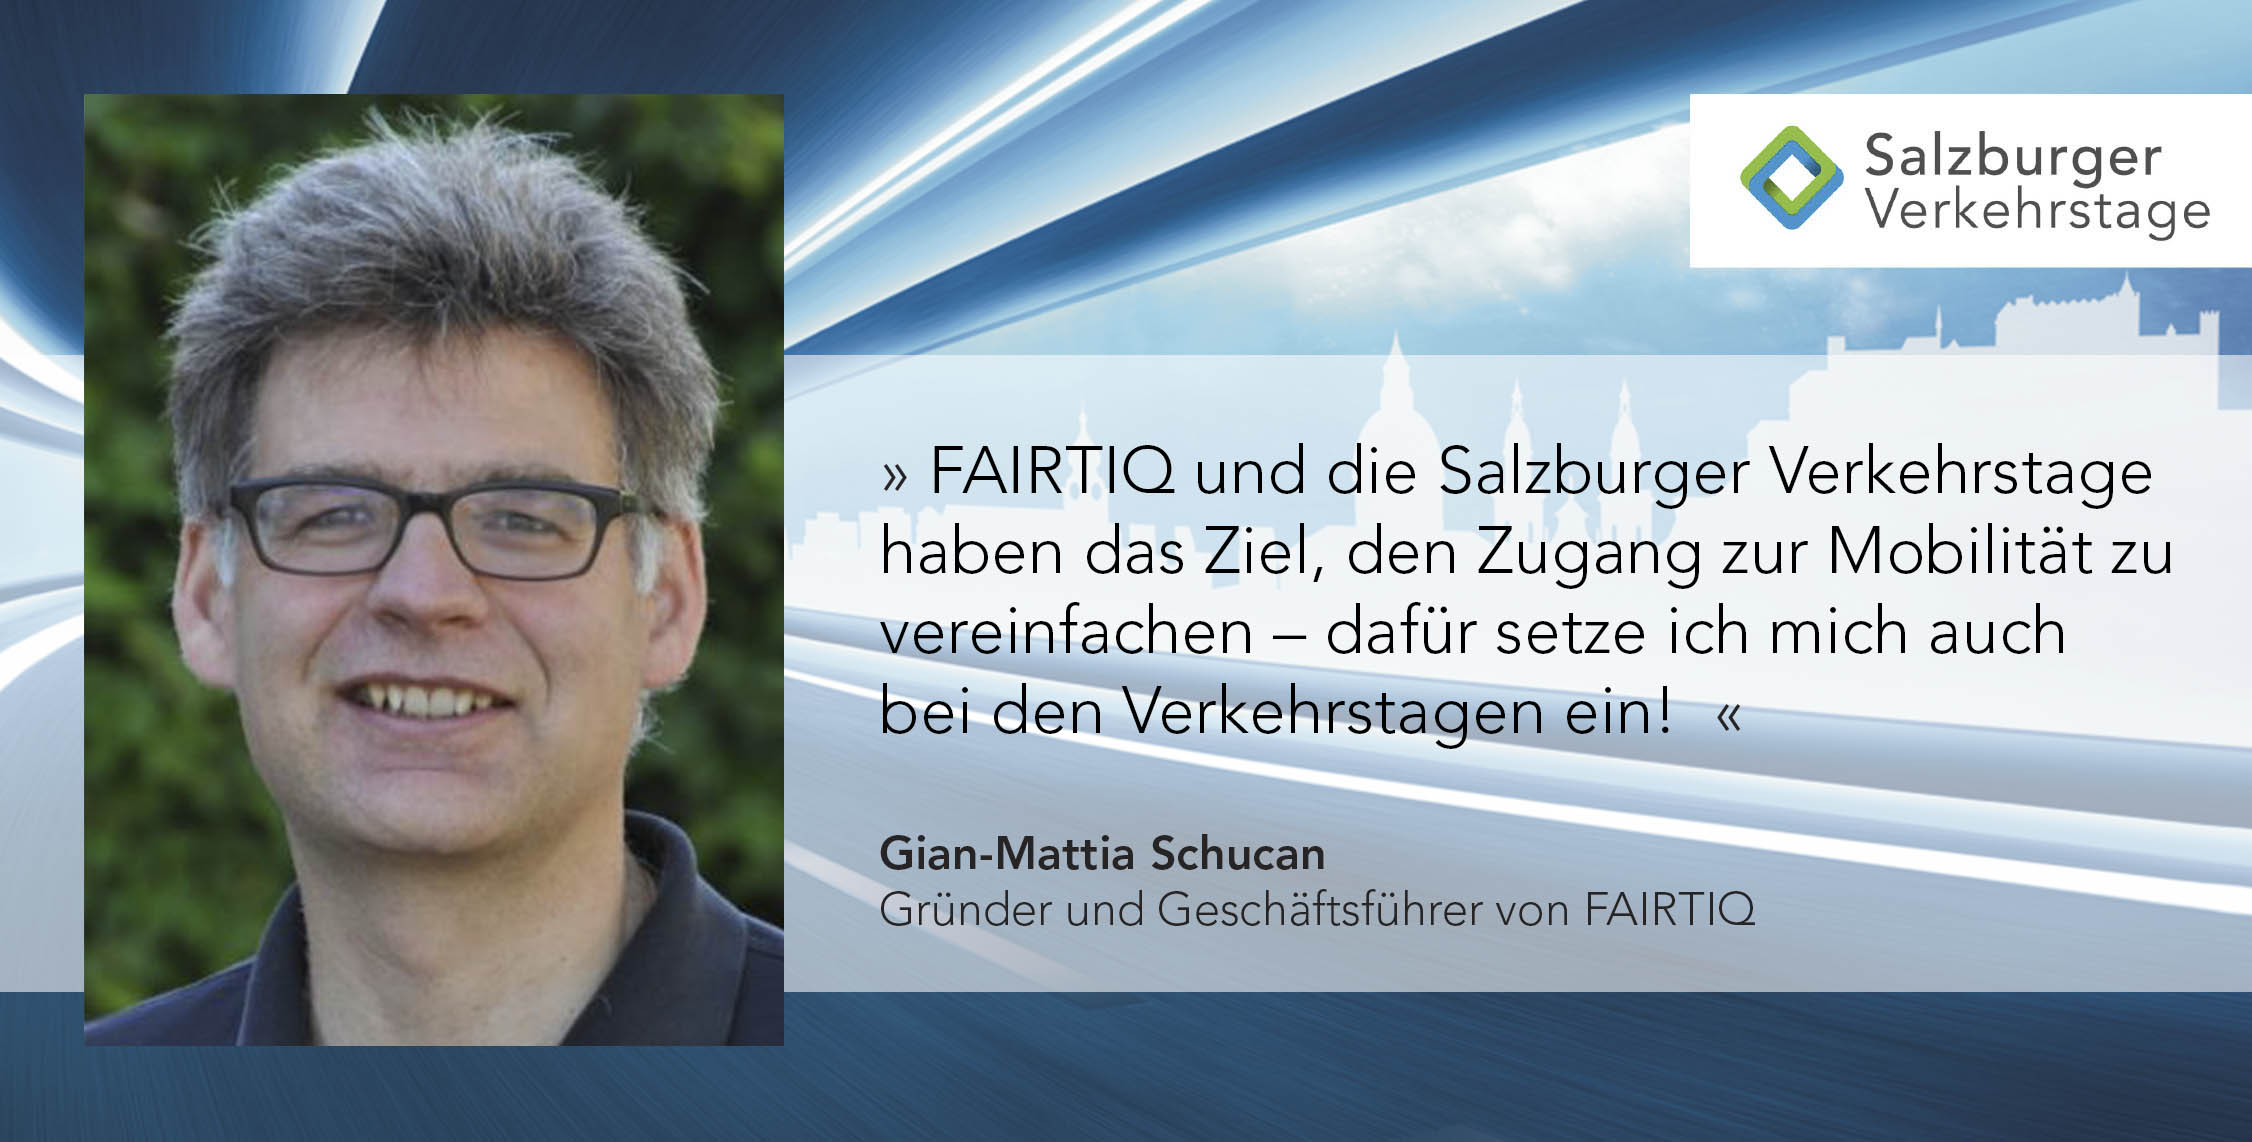 Schucan_Verkehrstage